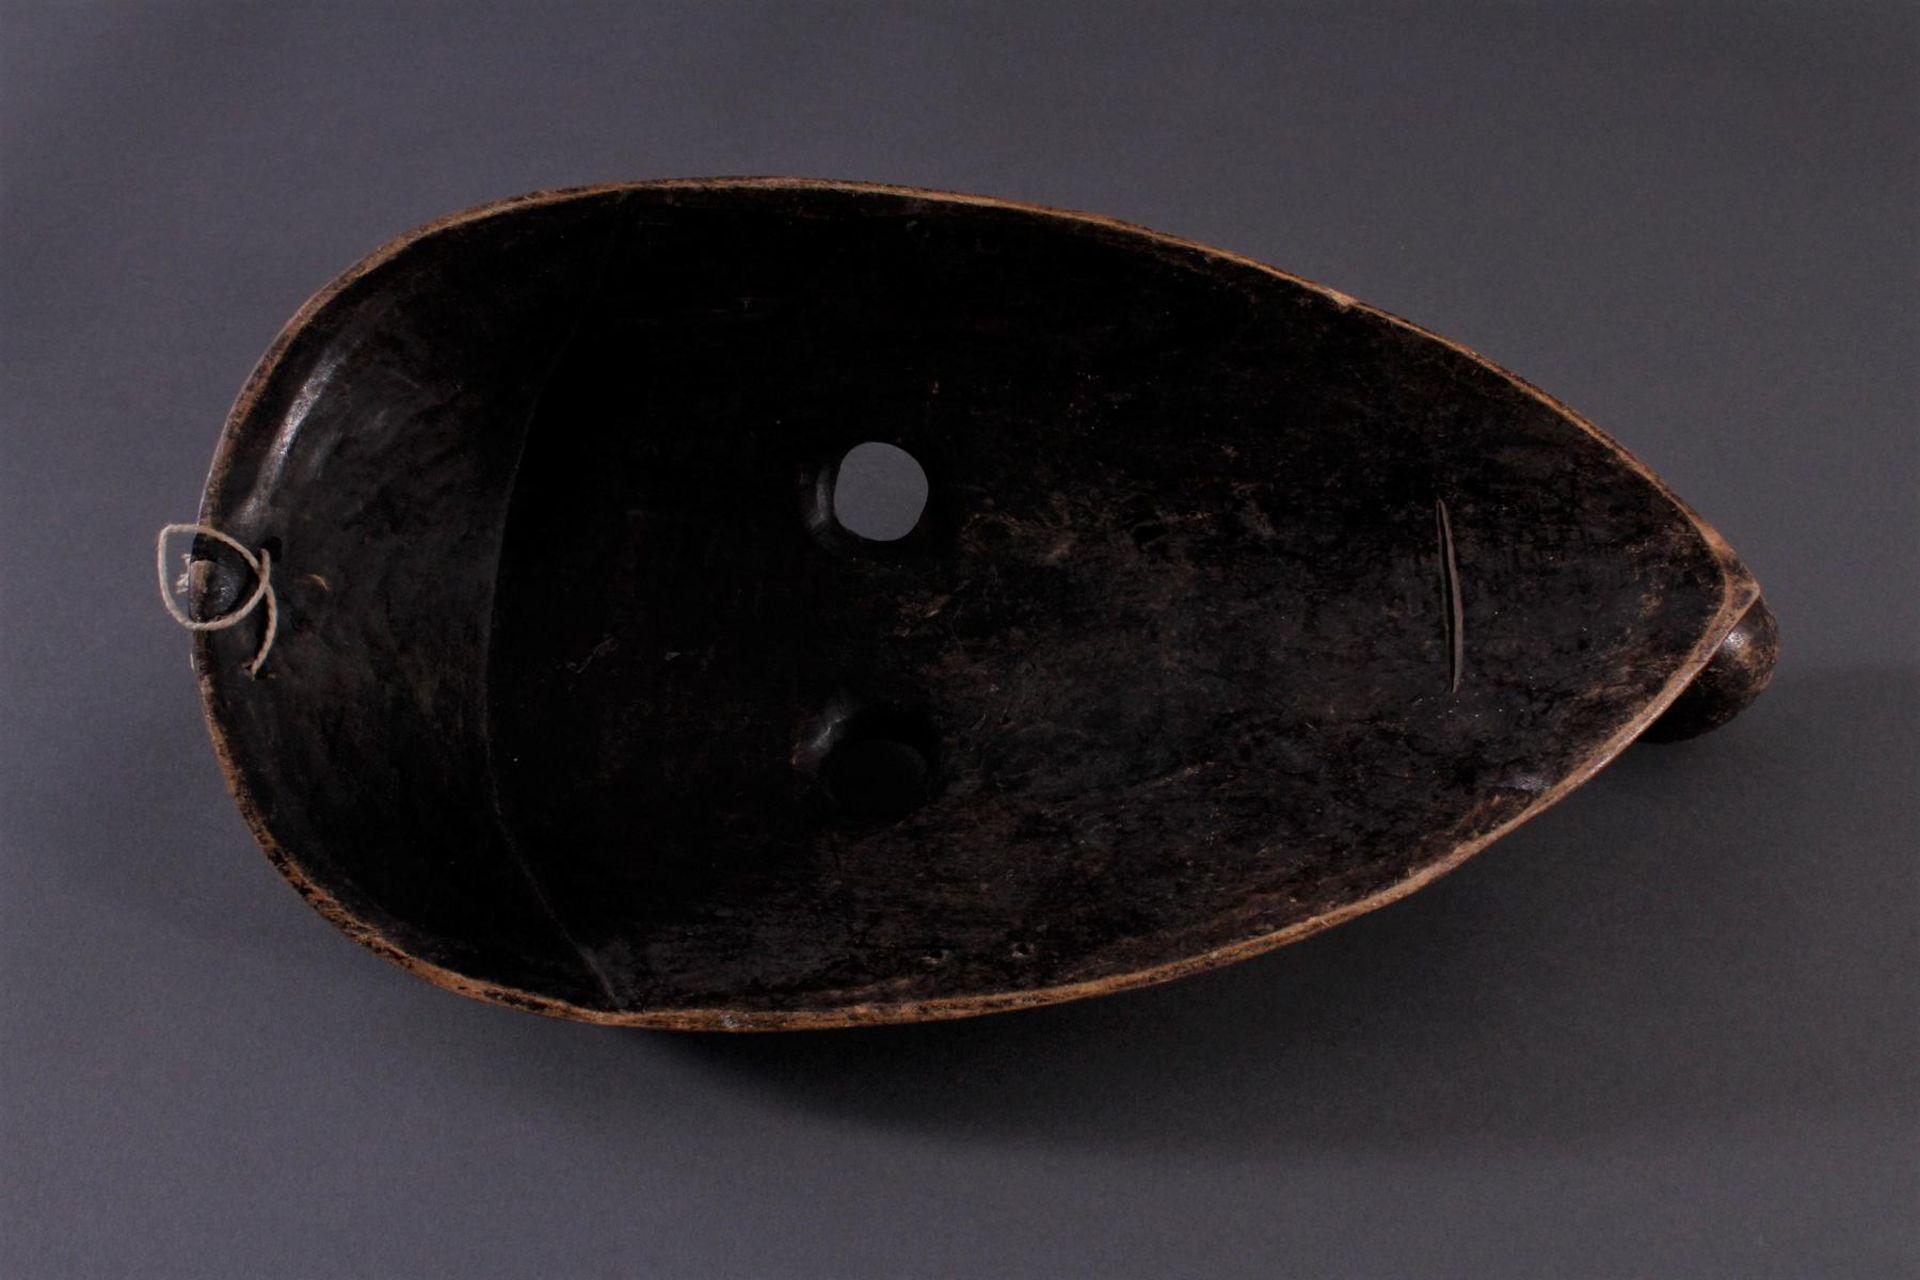 "Antike Holzmaske der Dan, 1. Hälfte 20. Jh.Holz geschnitzt, ""Pfeifenraucher"", dunkle Patina, - Bild 4 aus 4"